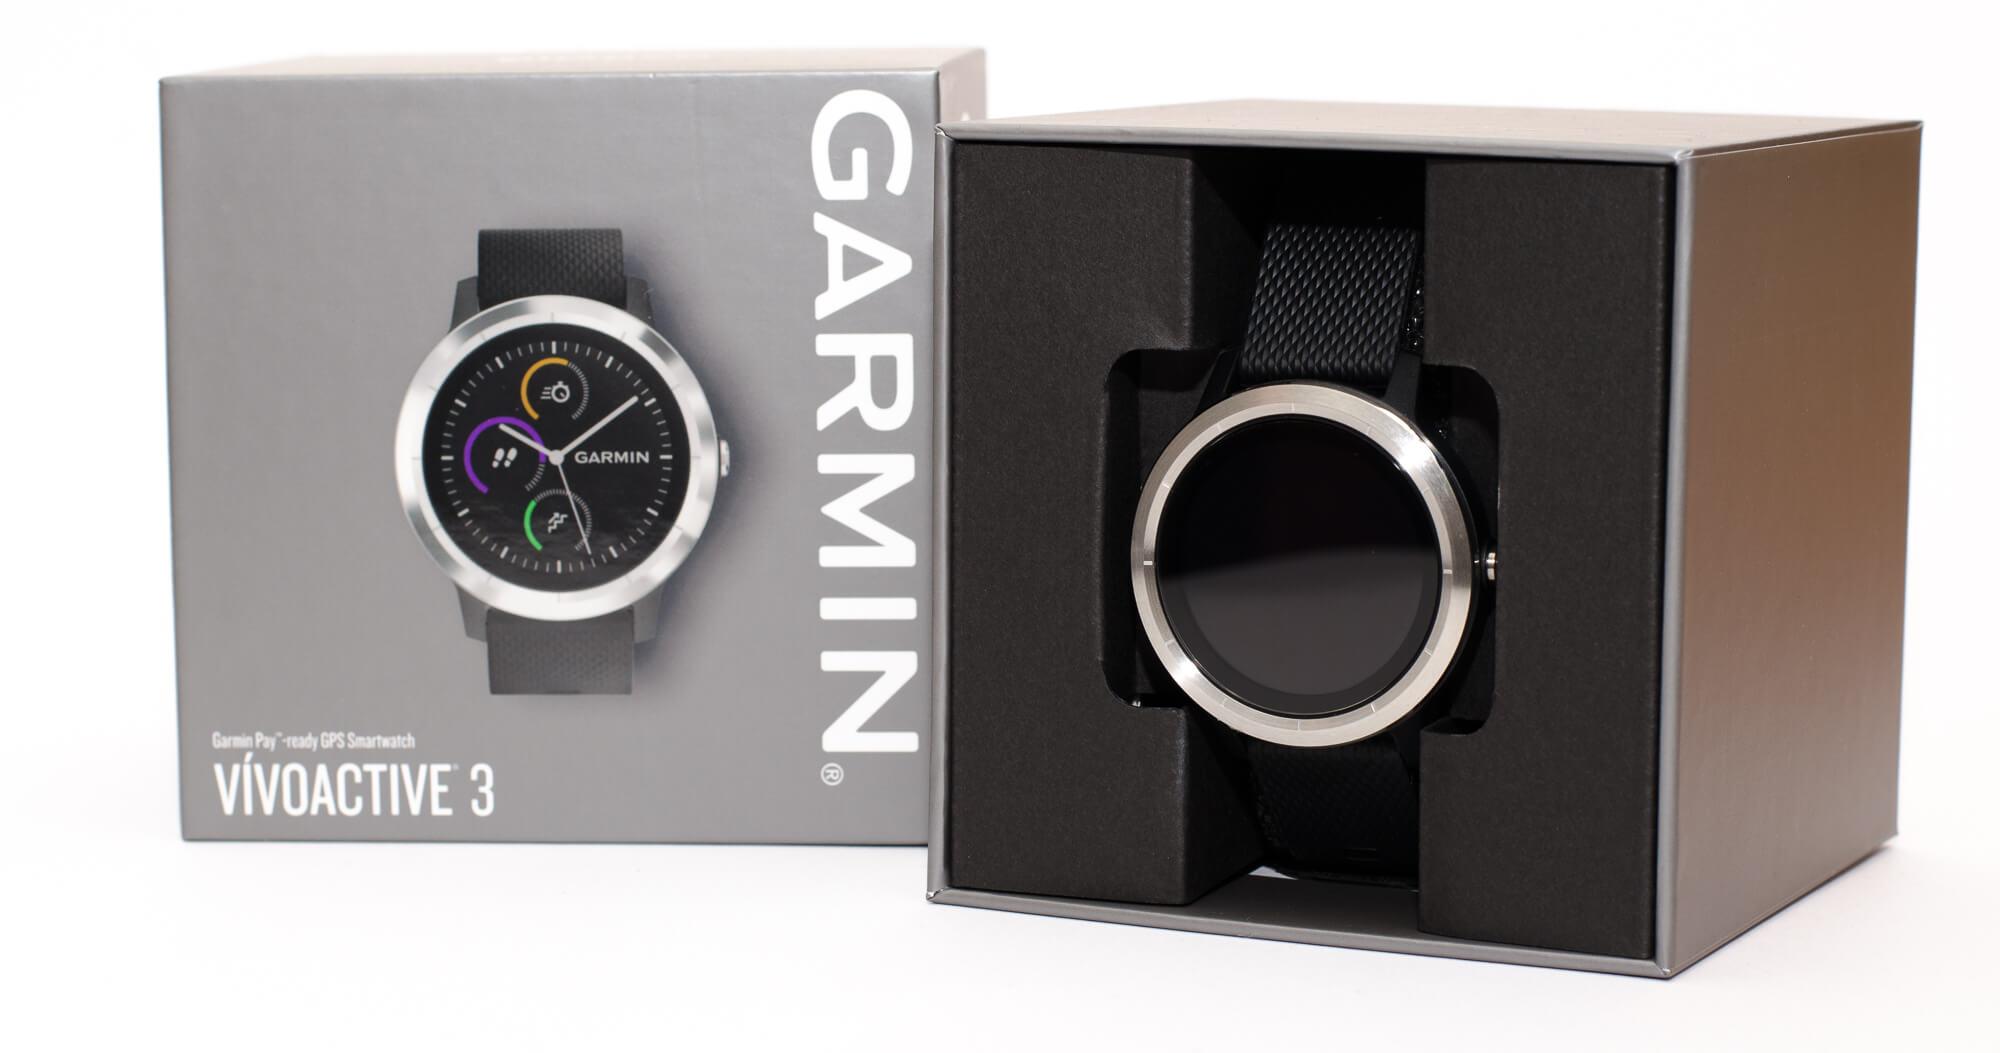 Garmin vivoactive 3 - Verpackung